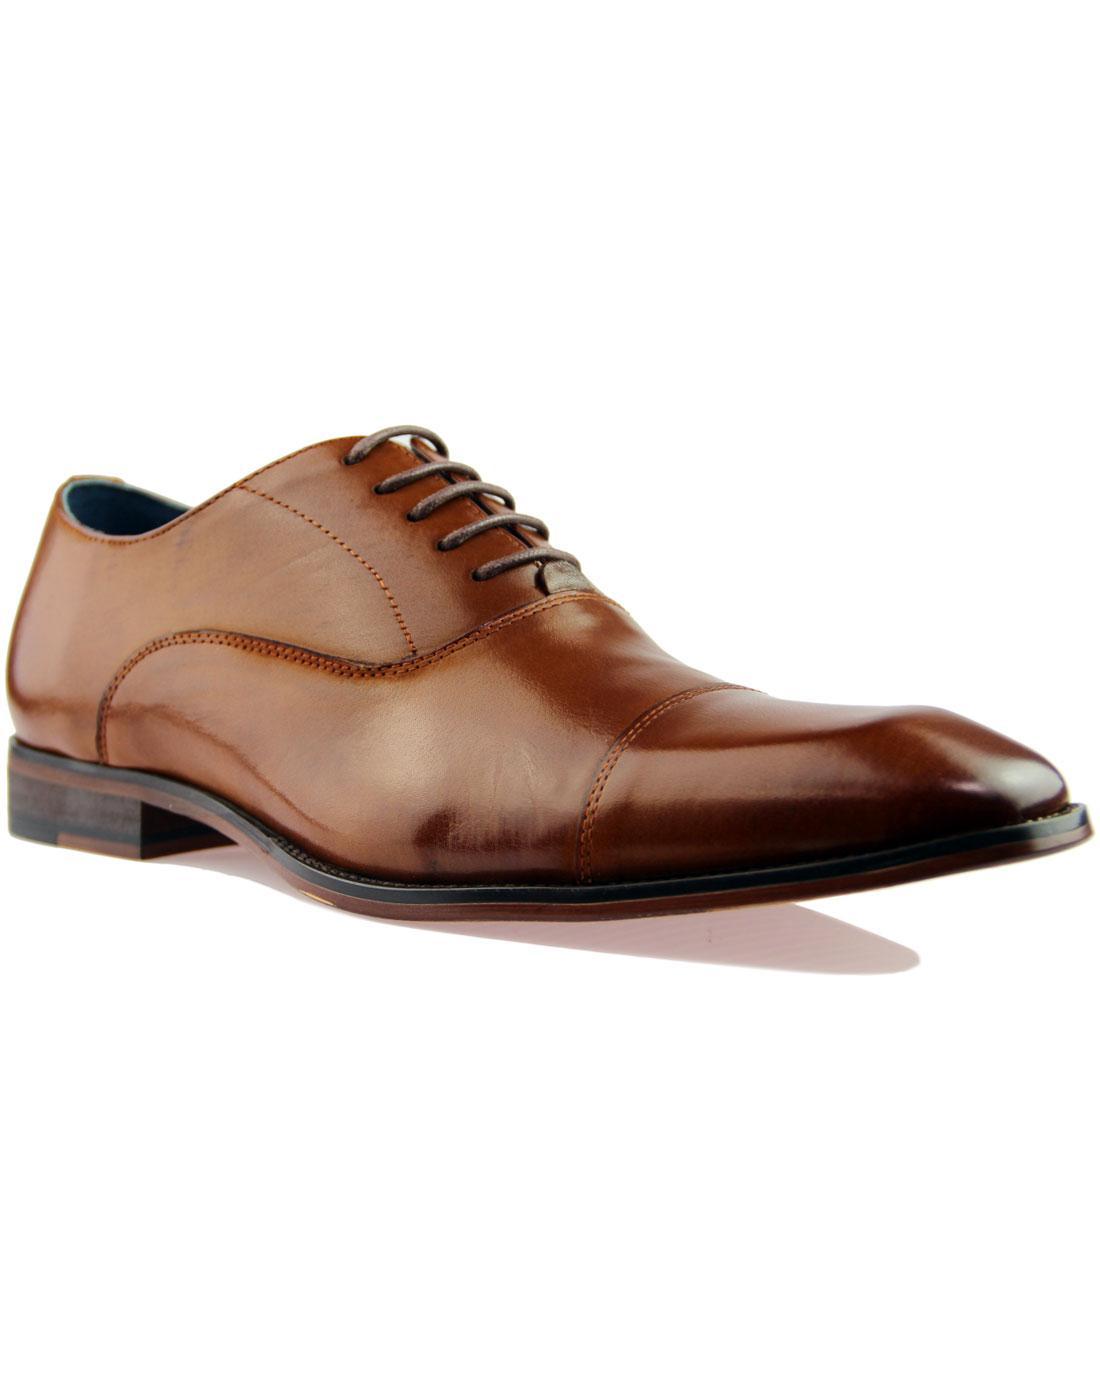 Thistle PAOLO VANDINI 60s Mod Oxford Toe Cap Shoes